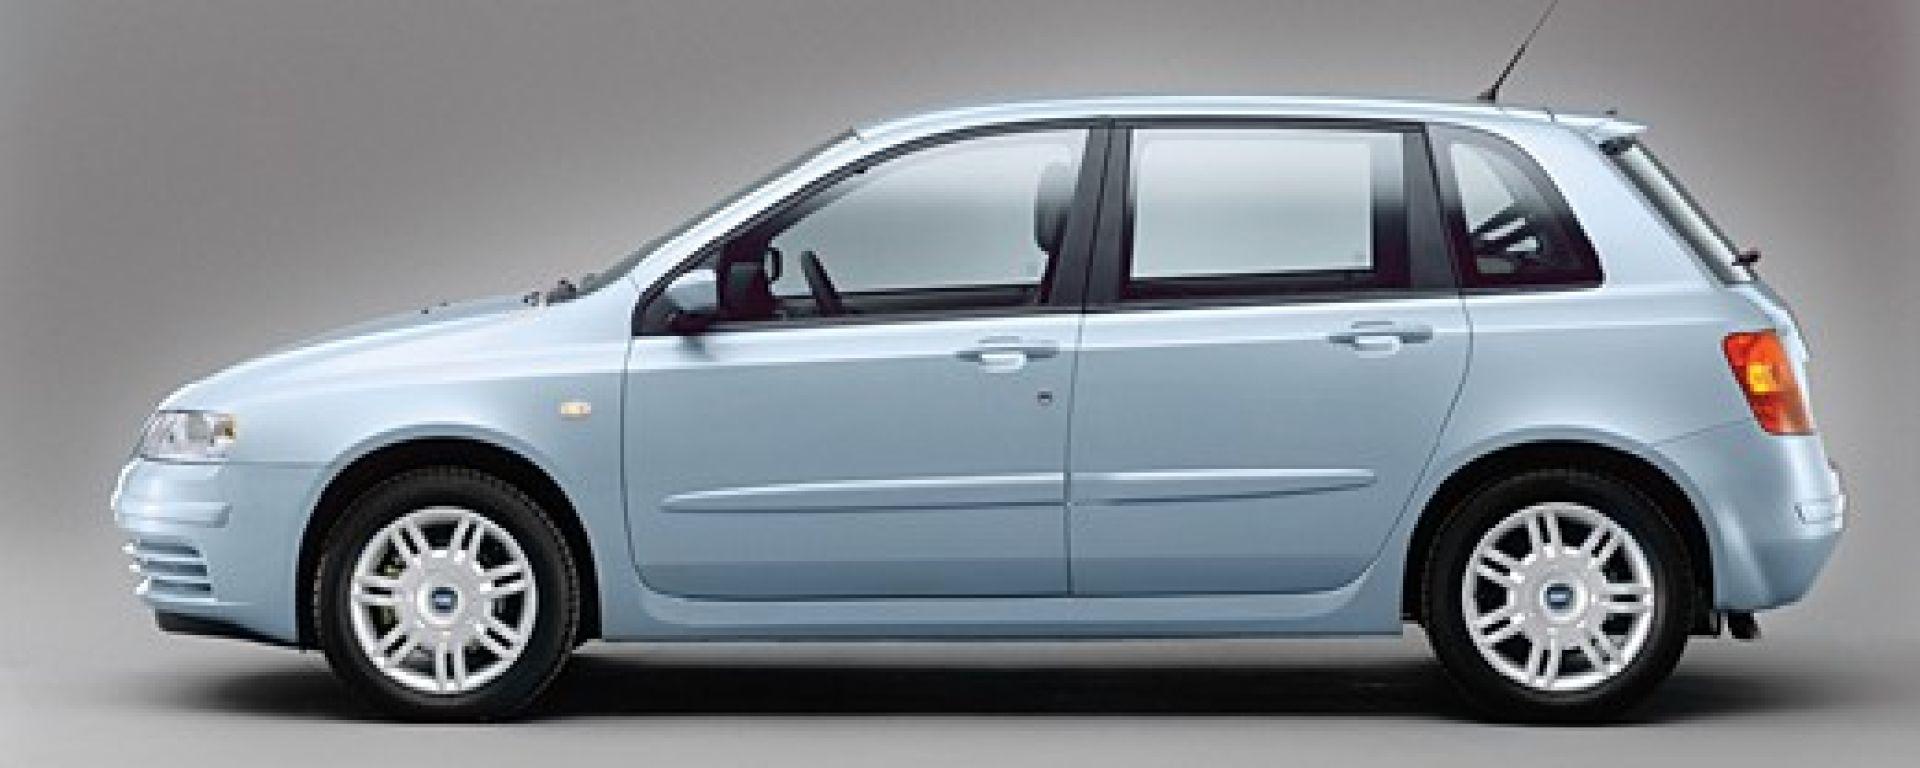 Anteprima  Fiat Stilo 2004